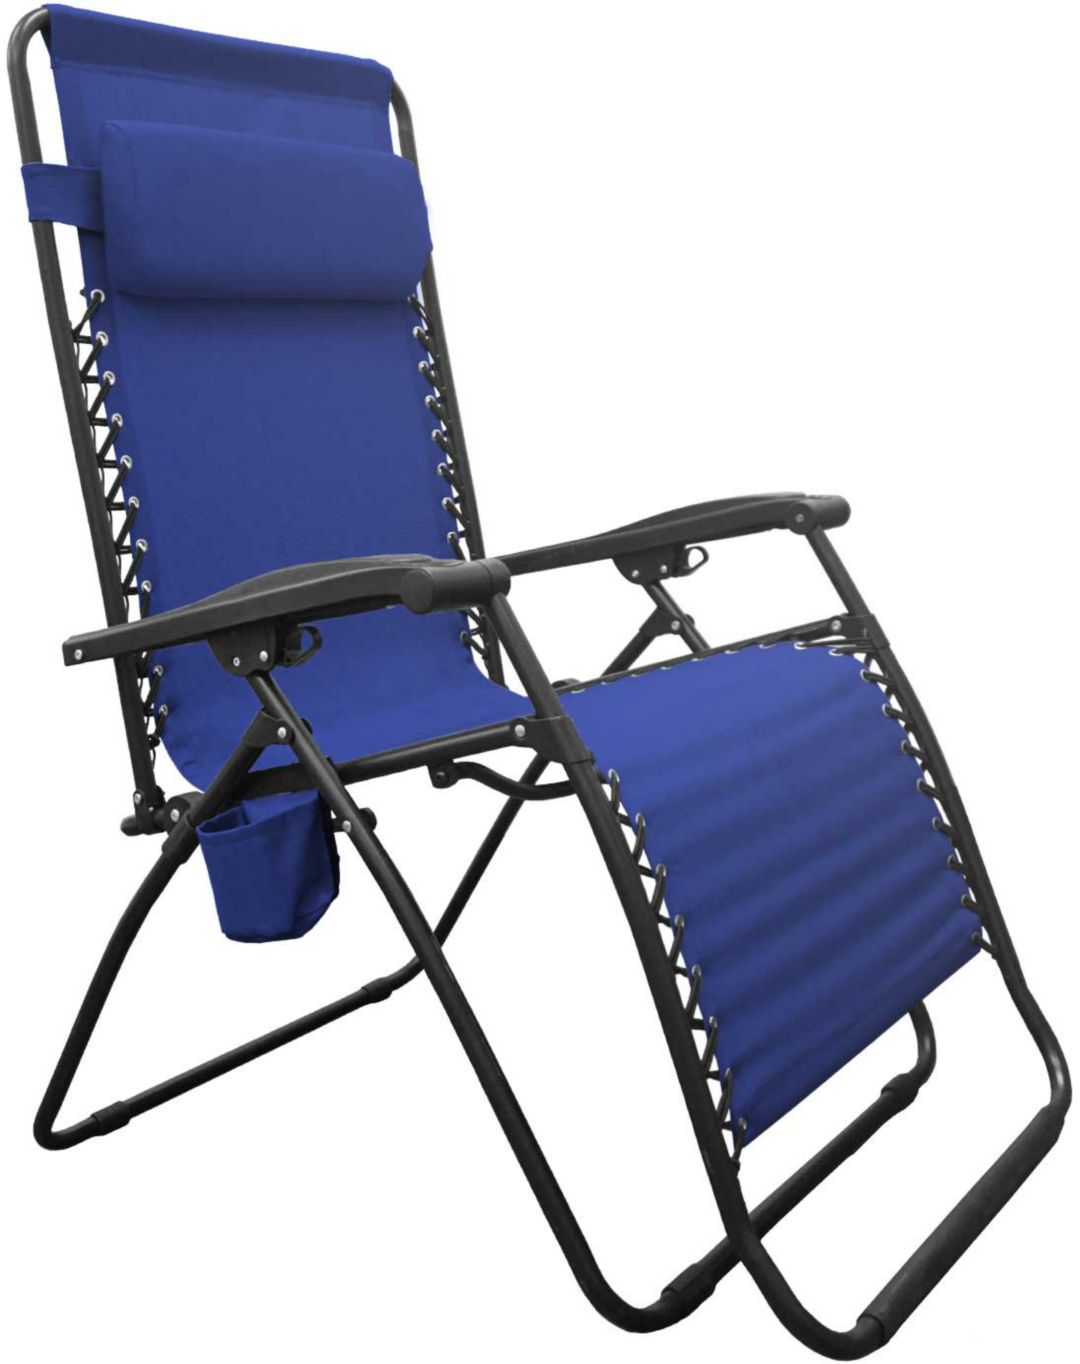 Pleasant Walmart Zero Gravity Chair The Arts Machost Co Dining Chair Design Ideas Machostcouk